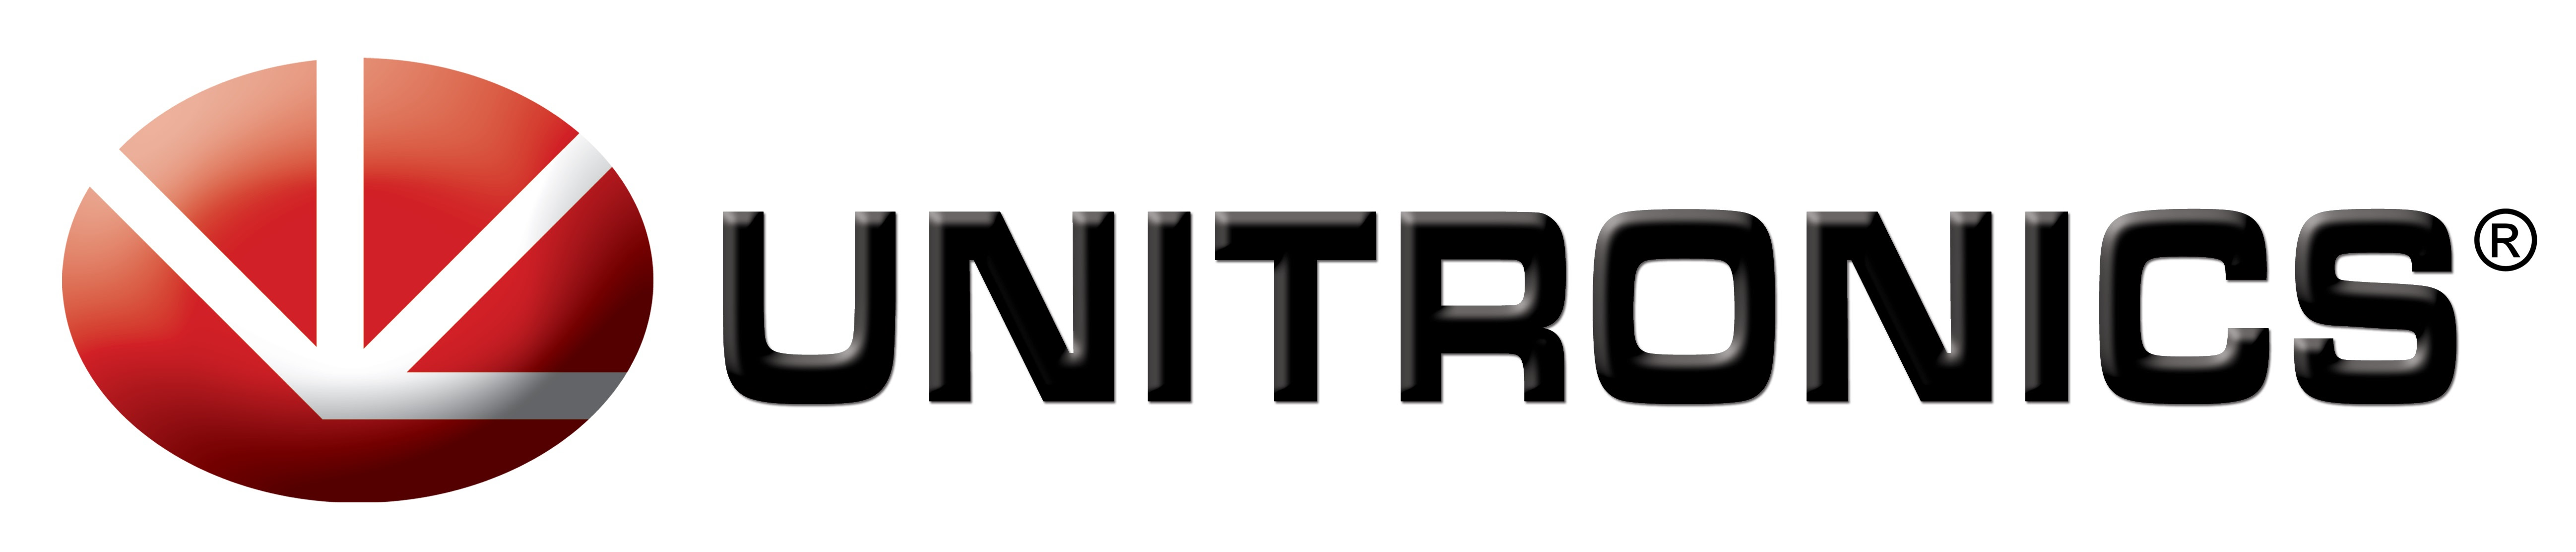 Logo_Unitronics_300DPIWHITE.jpg